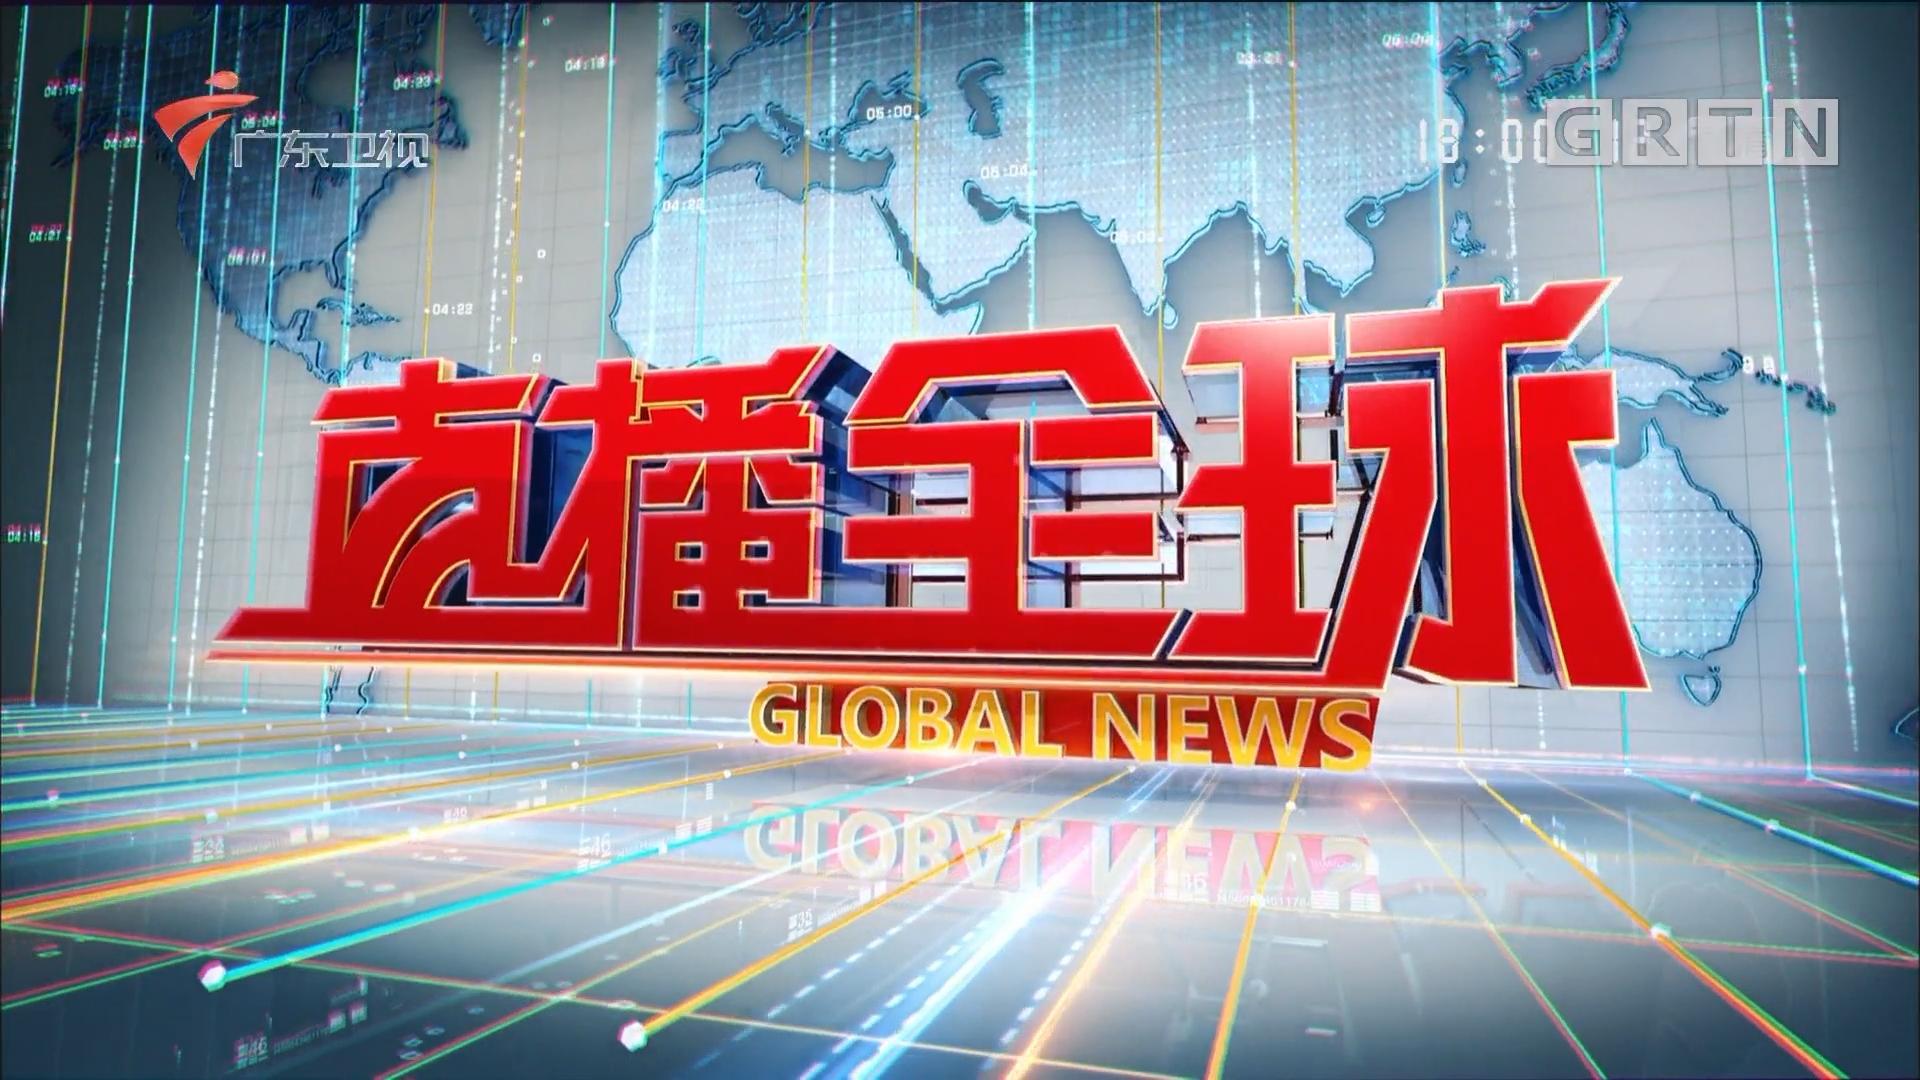 [HD][2017-07-04]直播全球:习近平会见俄罗斯总统普京 习普互动元首外交引领大国关系